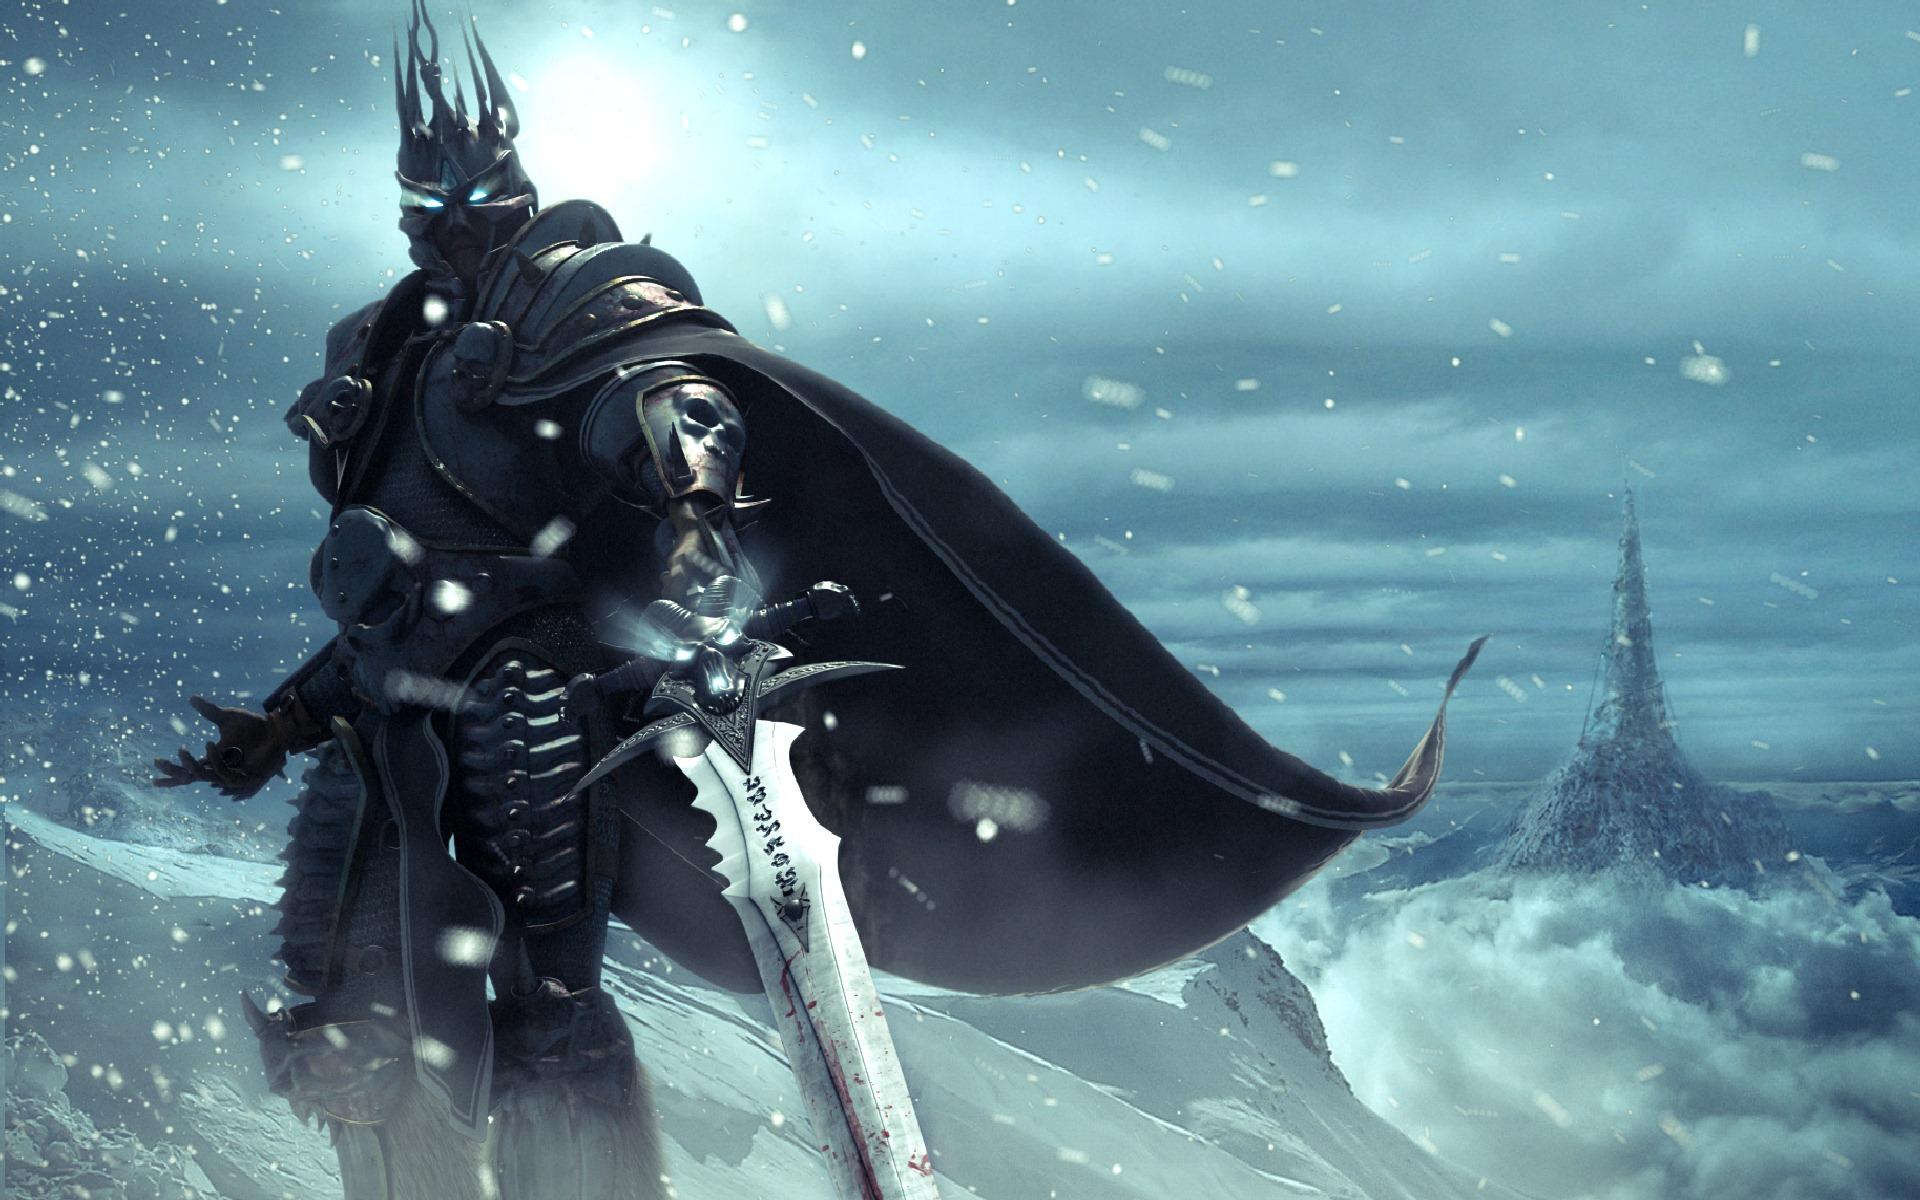 WOW Death Knight Wallpaper - WallpaperSafari